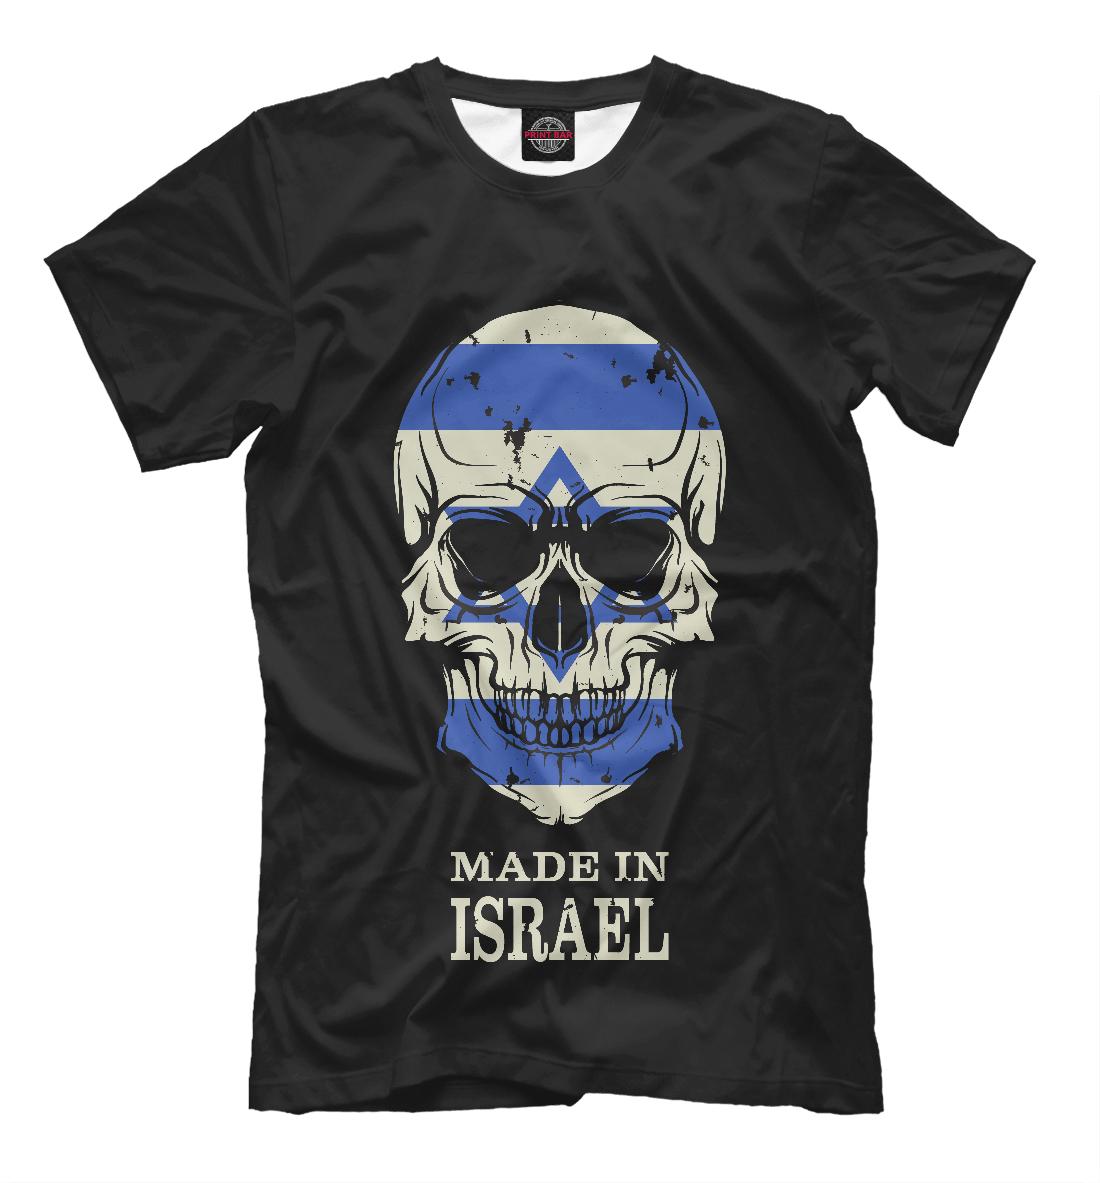 Made in Israel jacob israel liberman luminous life